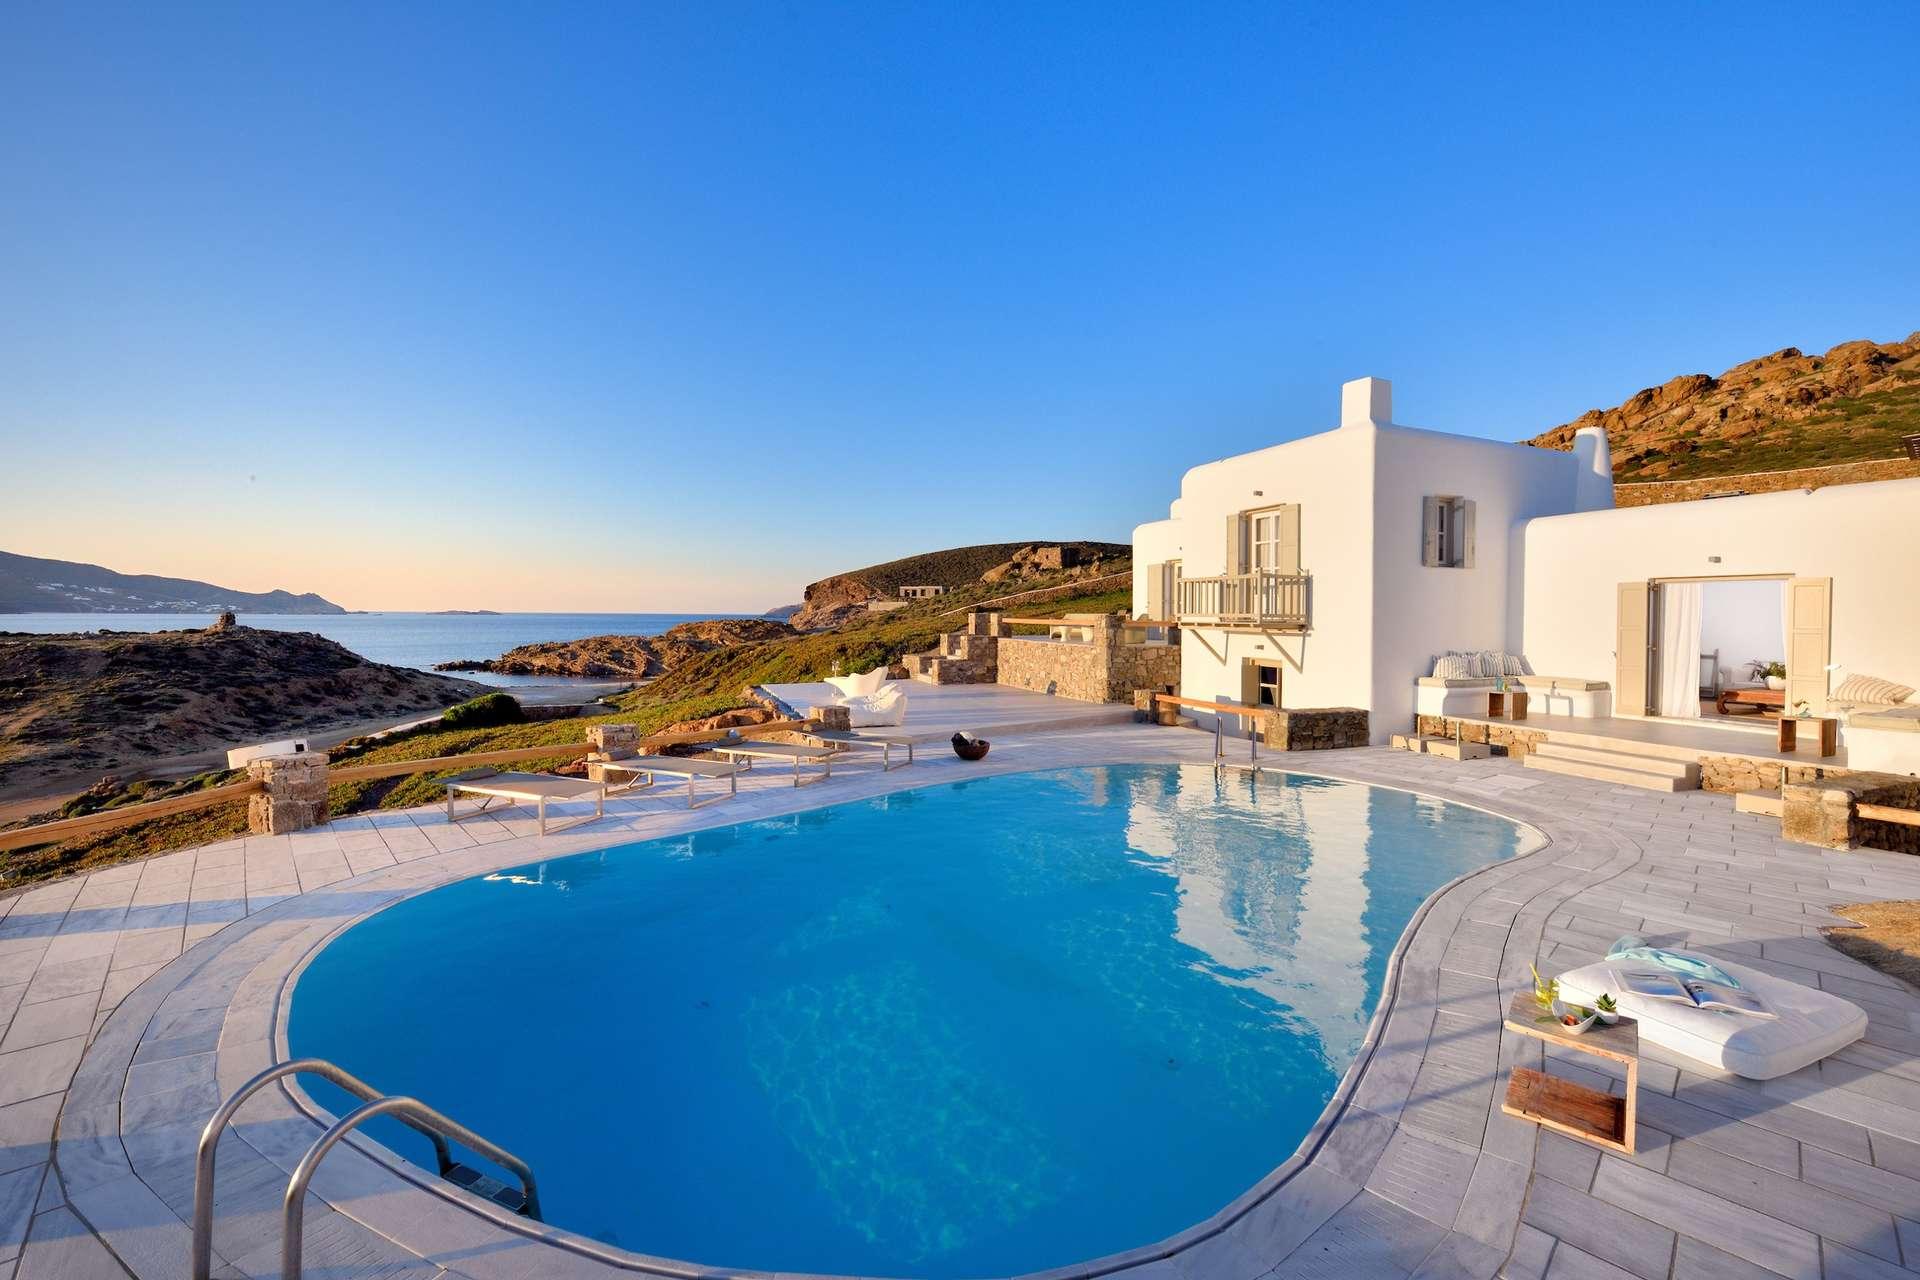 Luxury vacation rentals europe - Greece - Mykonos - Mykonos town - Villa Juliet - Image 1/22